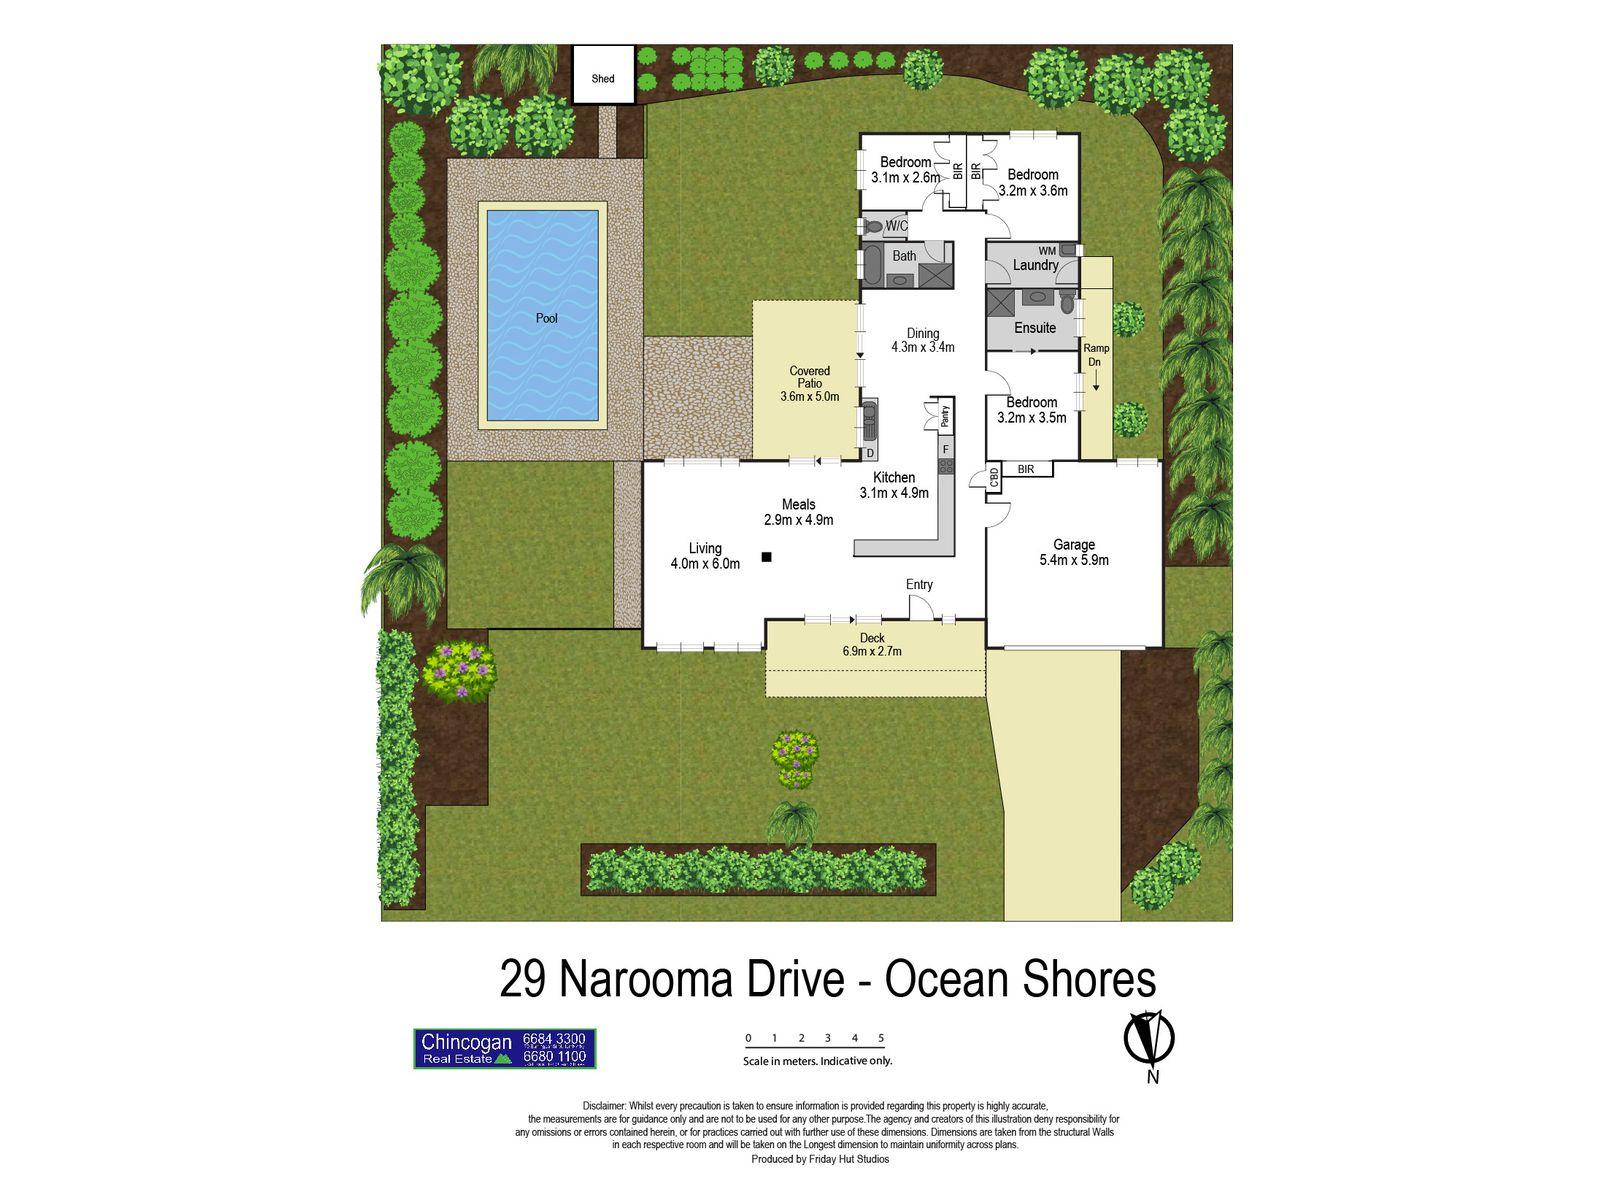 29 Narooma Drive, Ocean Shores